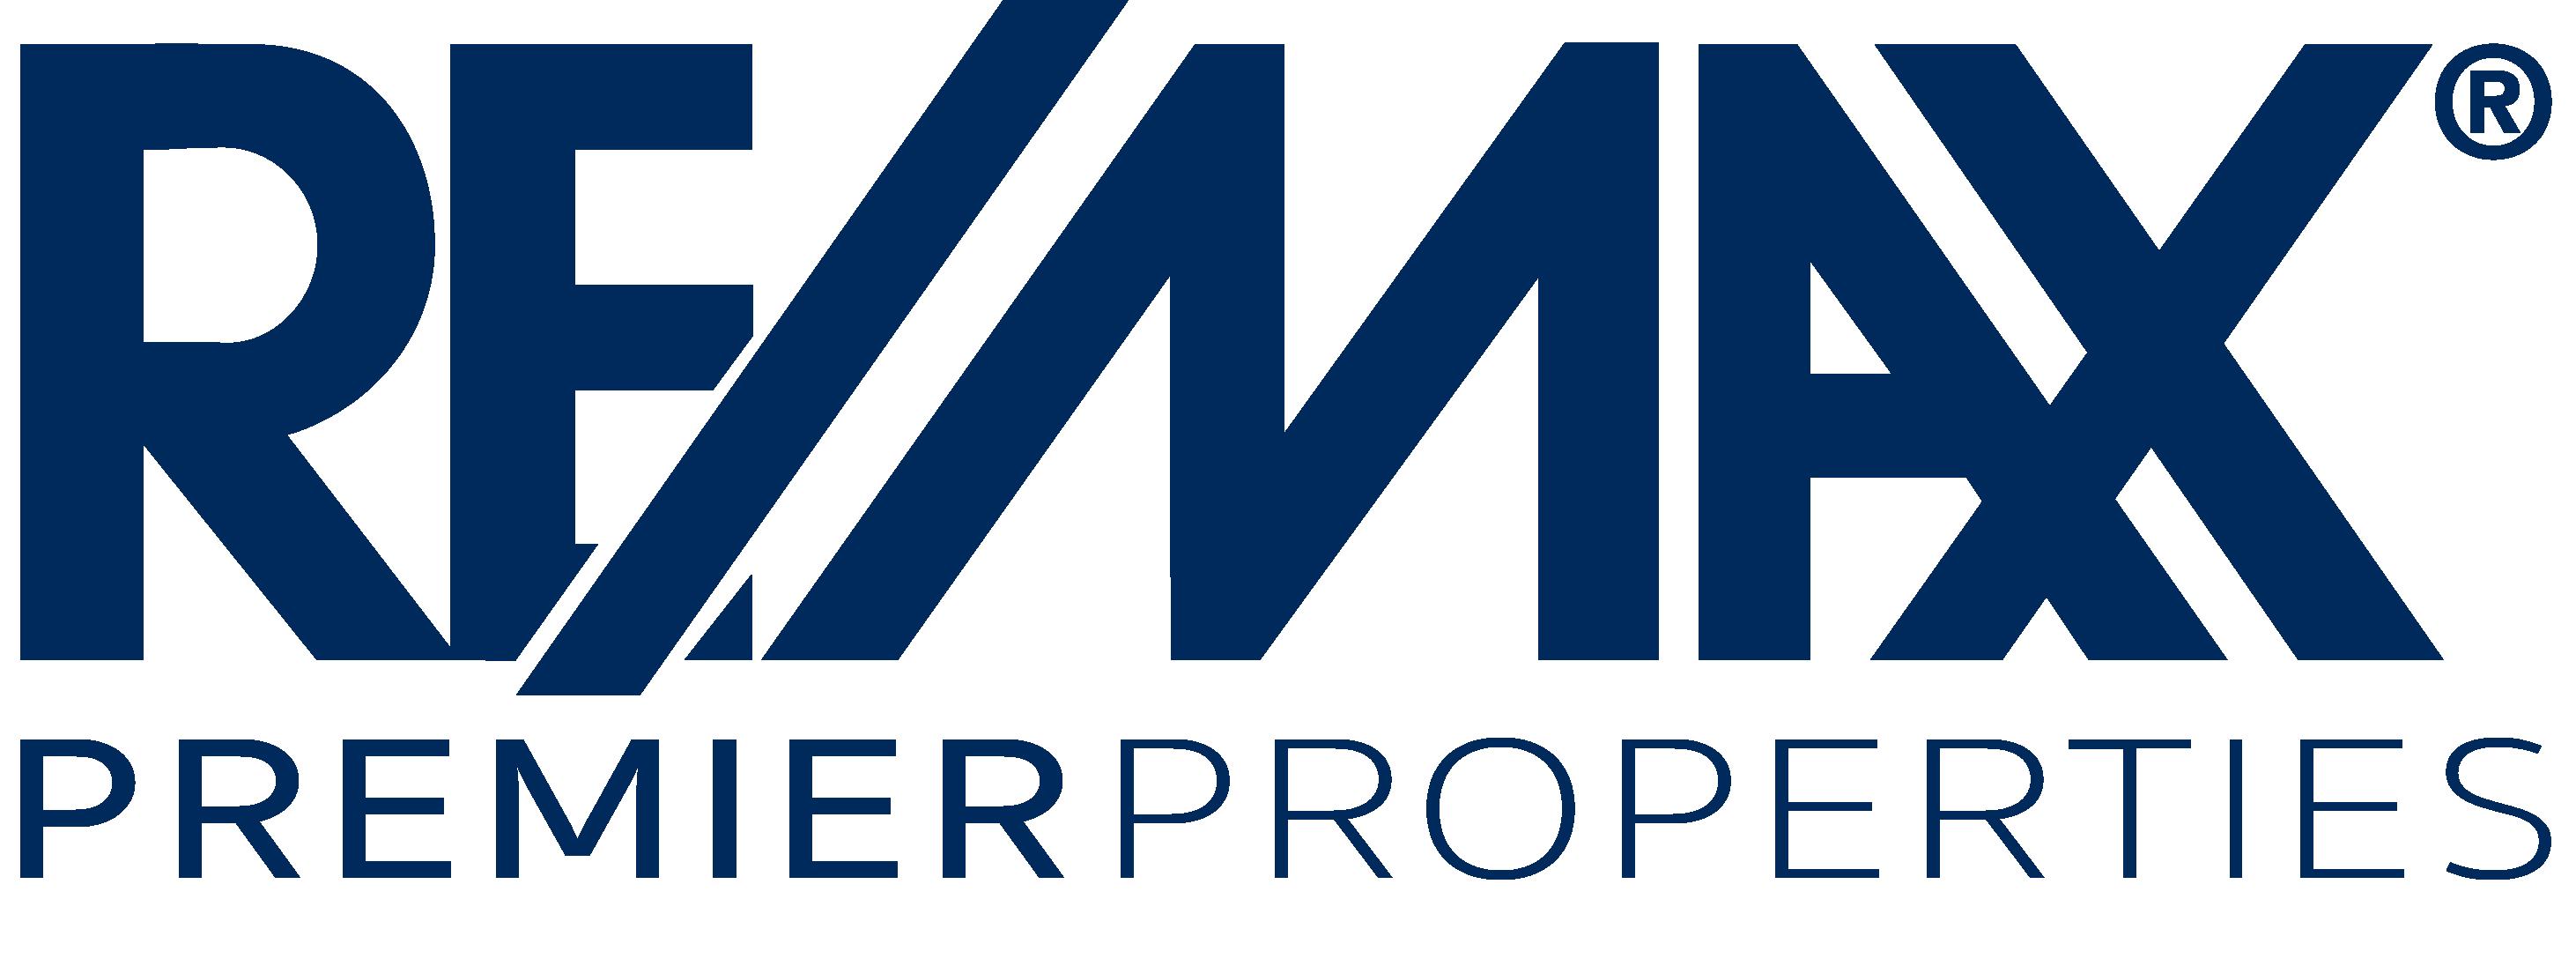 RE/MAX Premier Properties logo